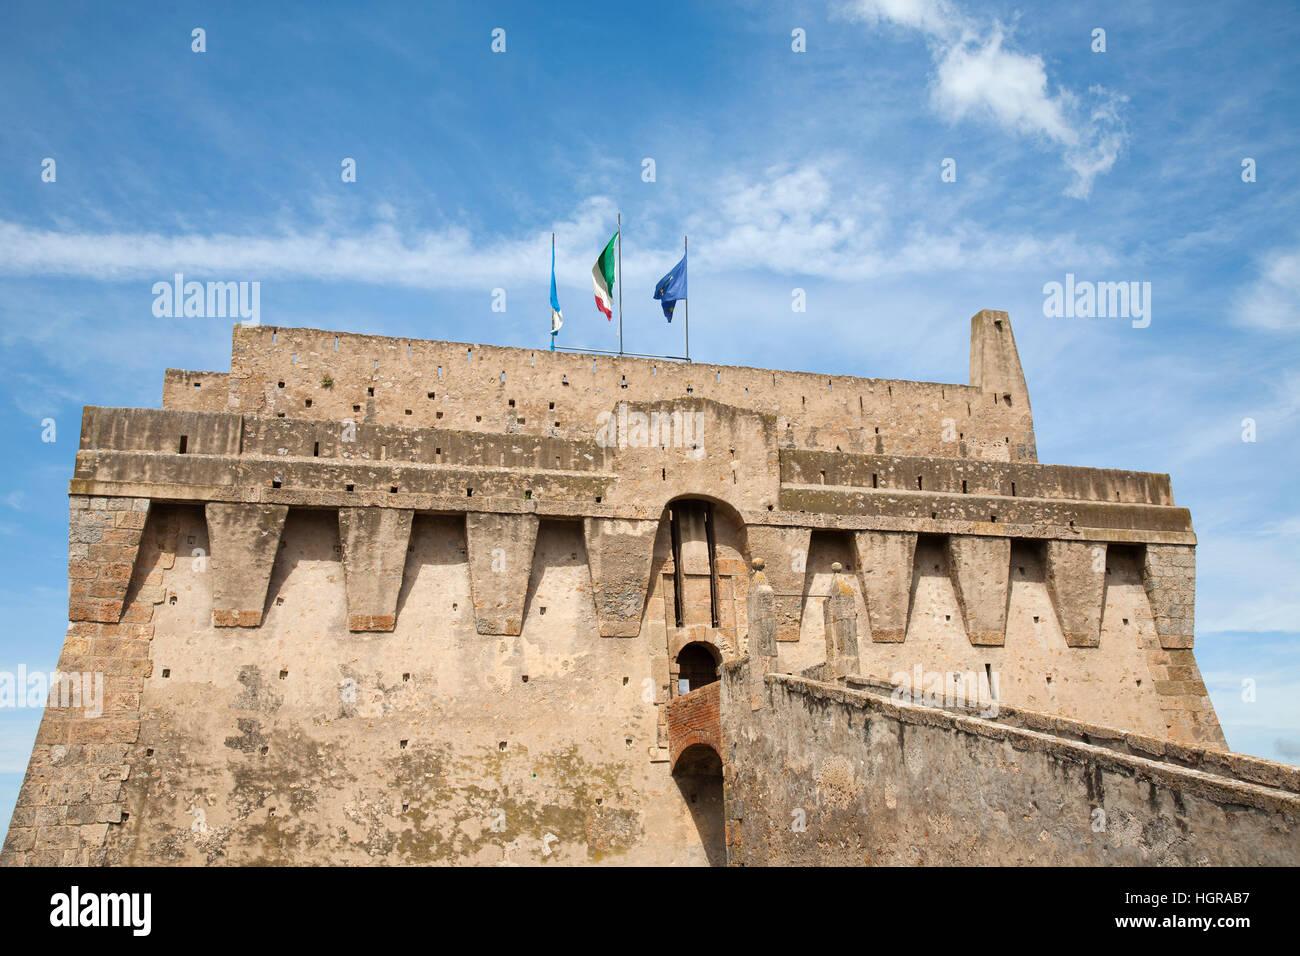 La Rocca, Porto Santo Stefano, Argentario, Tuscany, Italy, Europe - Stock Image